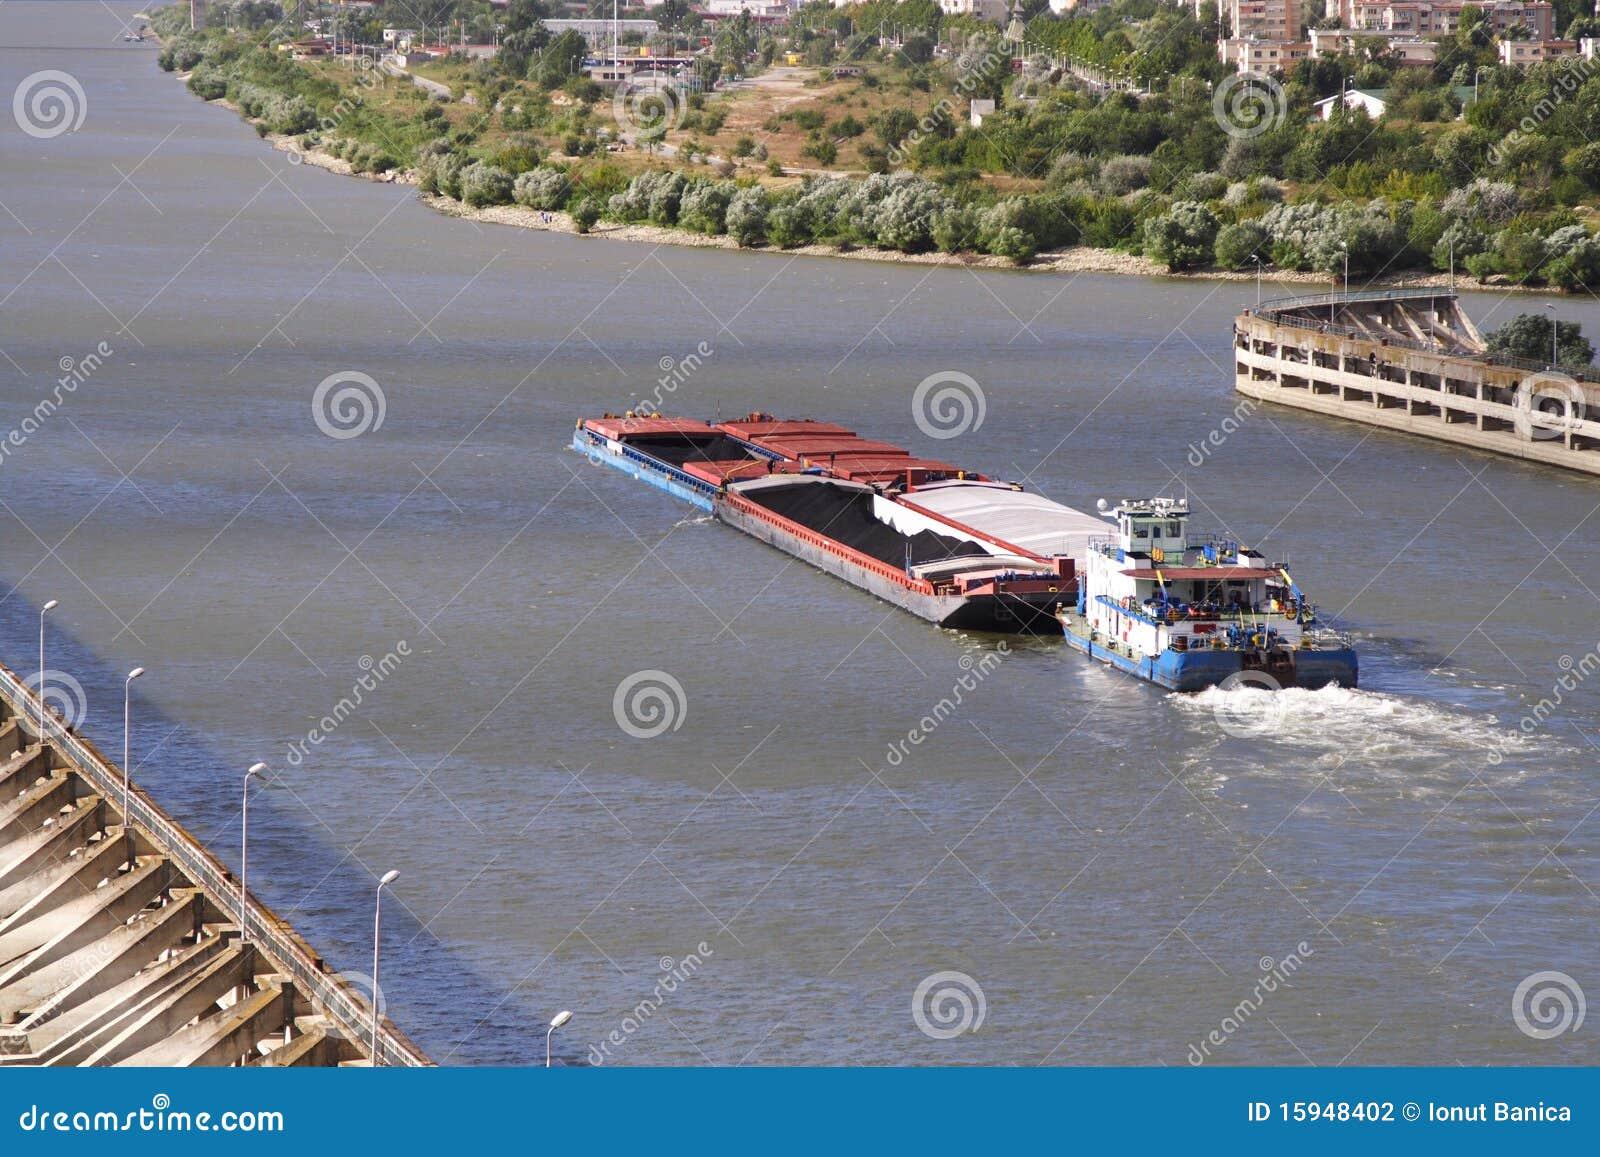 Moving barge